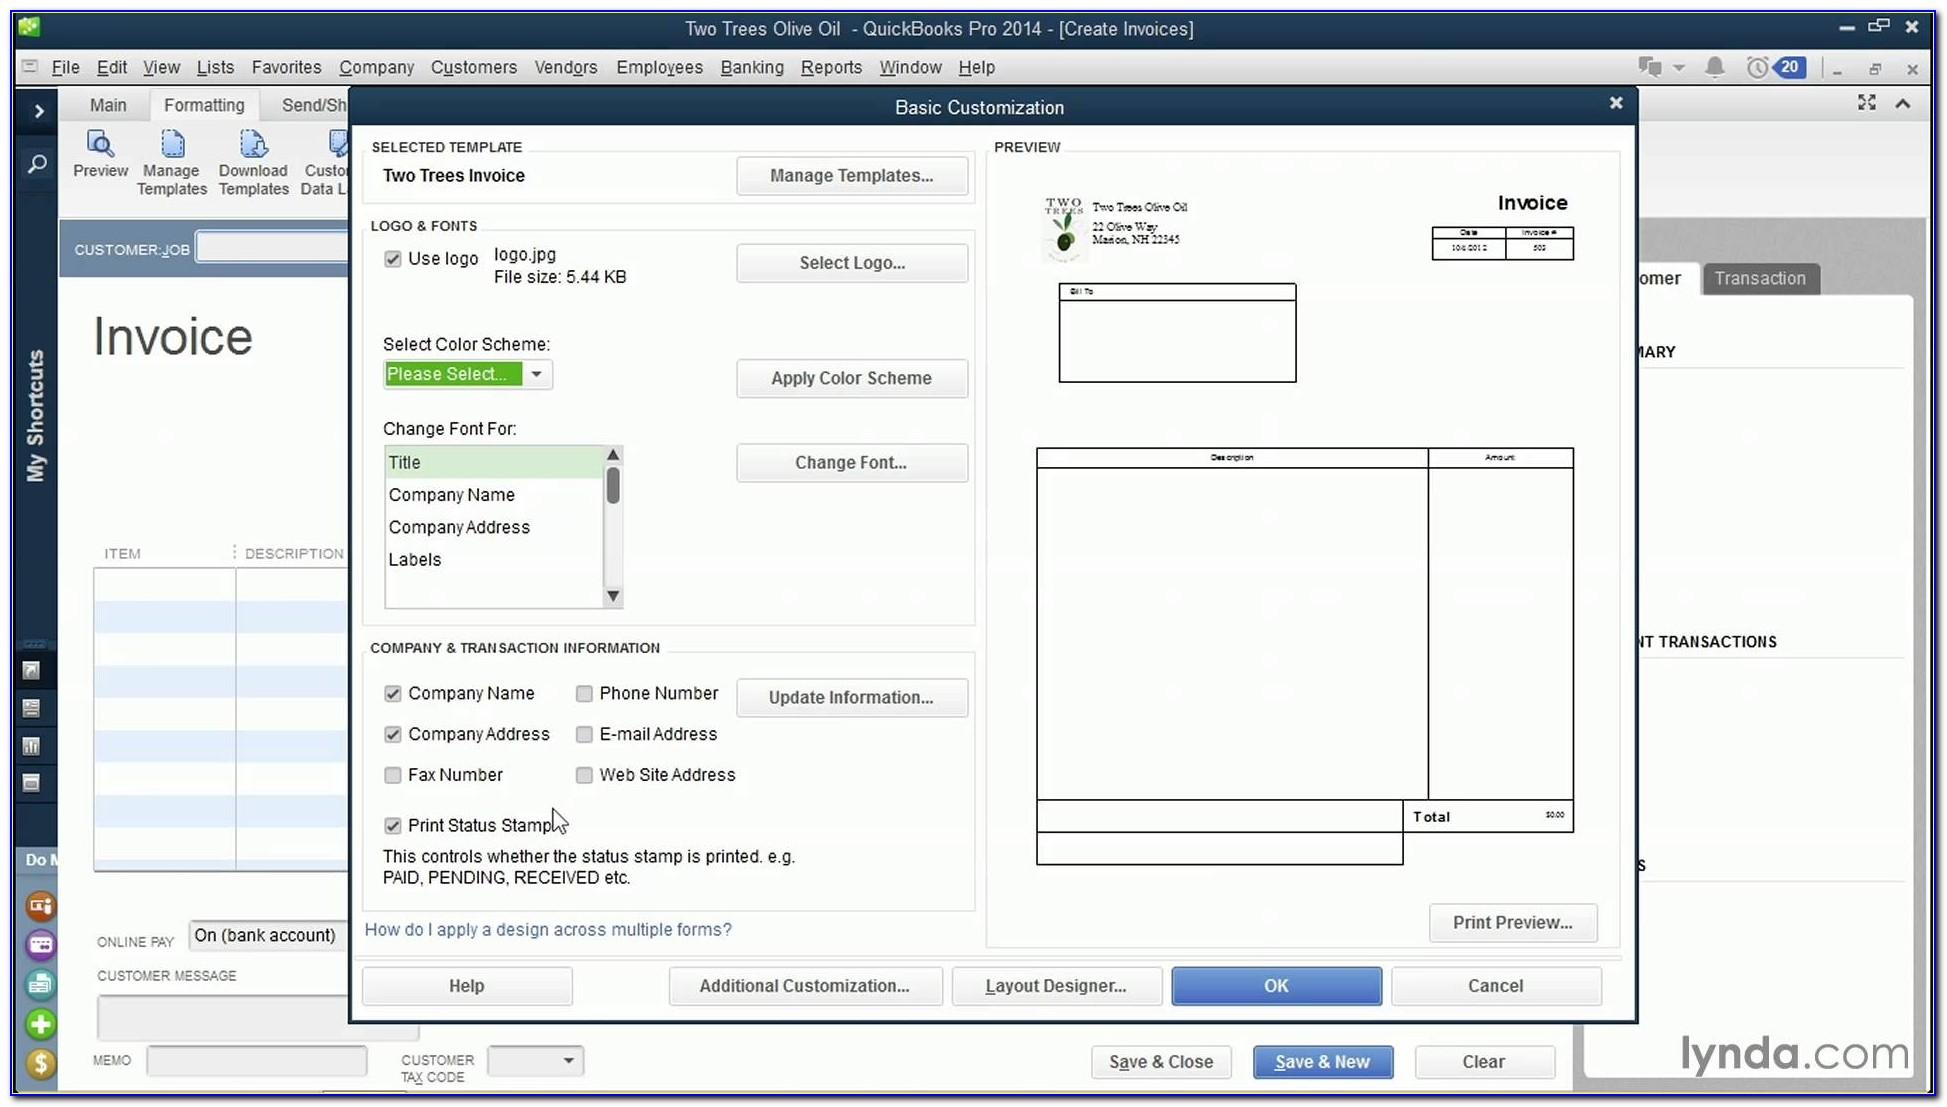 Example Quickbooks Invoice